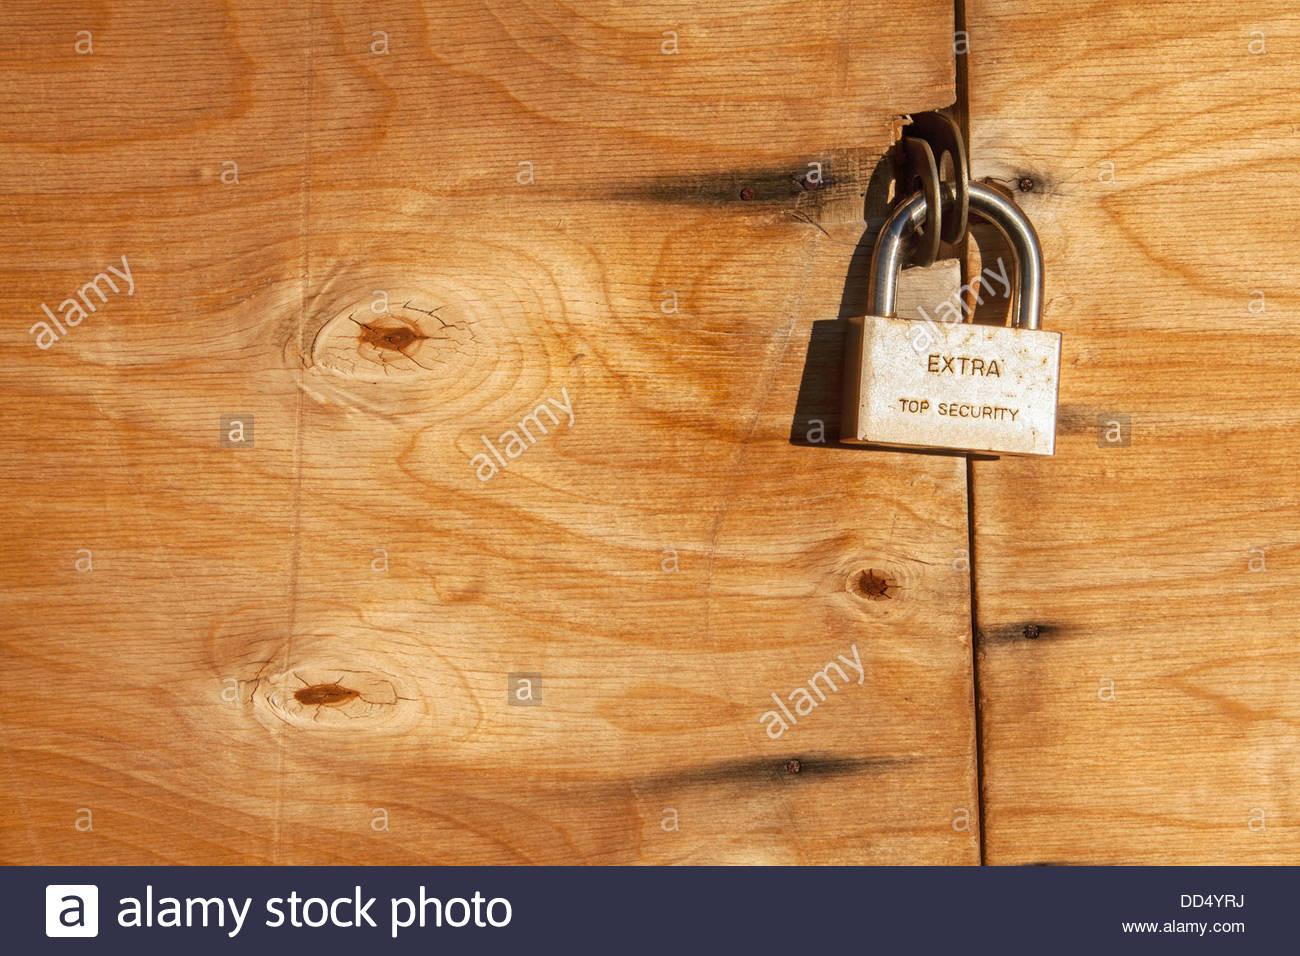 hardwood floor refinishing eugene oregon of top hinged stock photos top hinged stock images alamy regarding hinged lock on a wooden door canon 5d mk ii